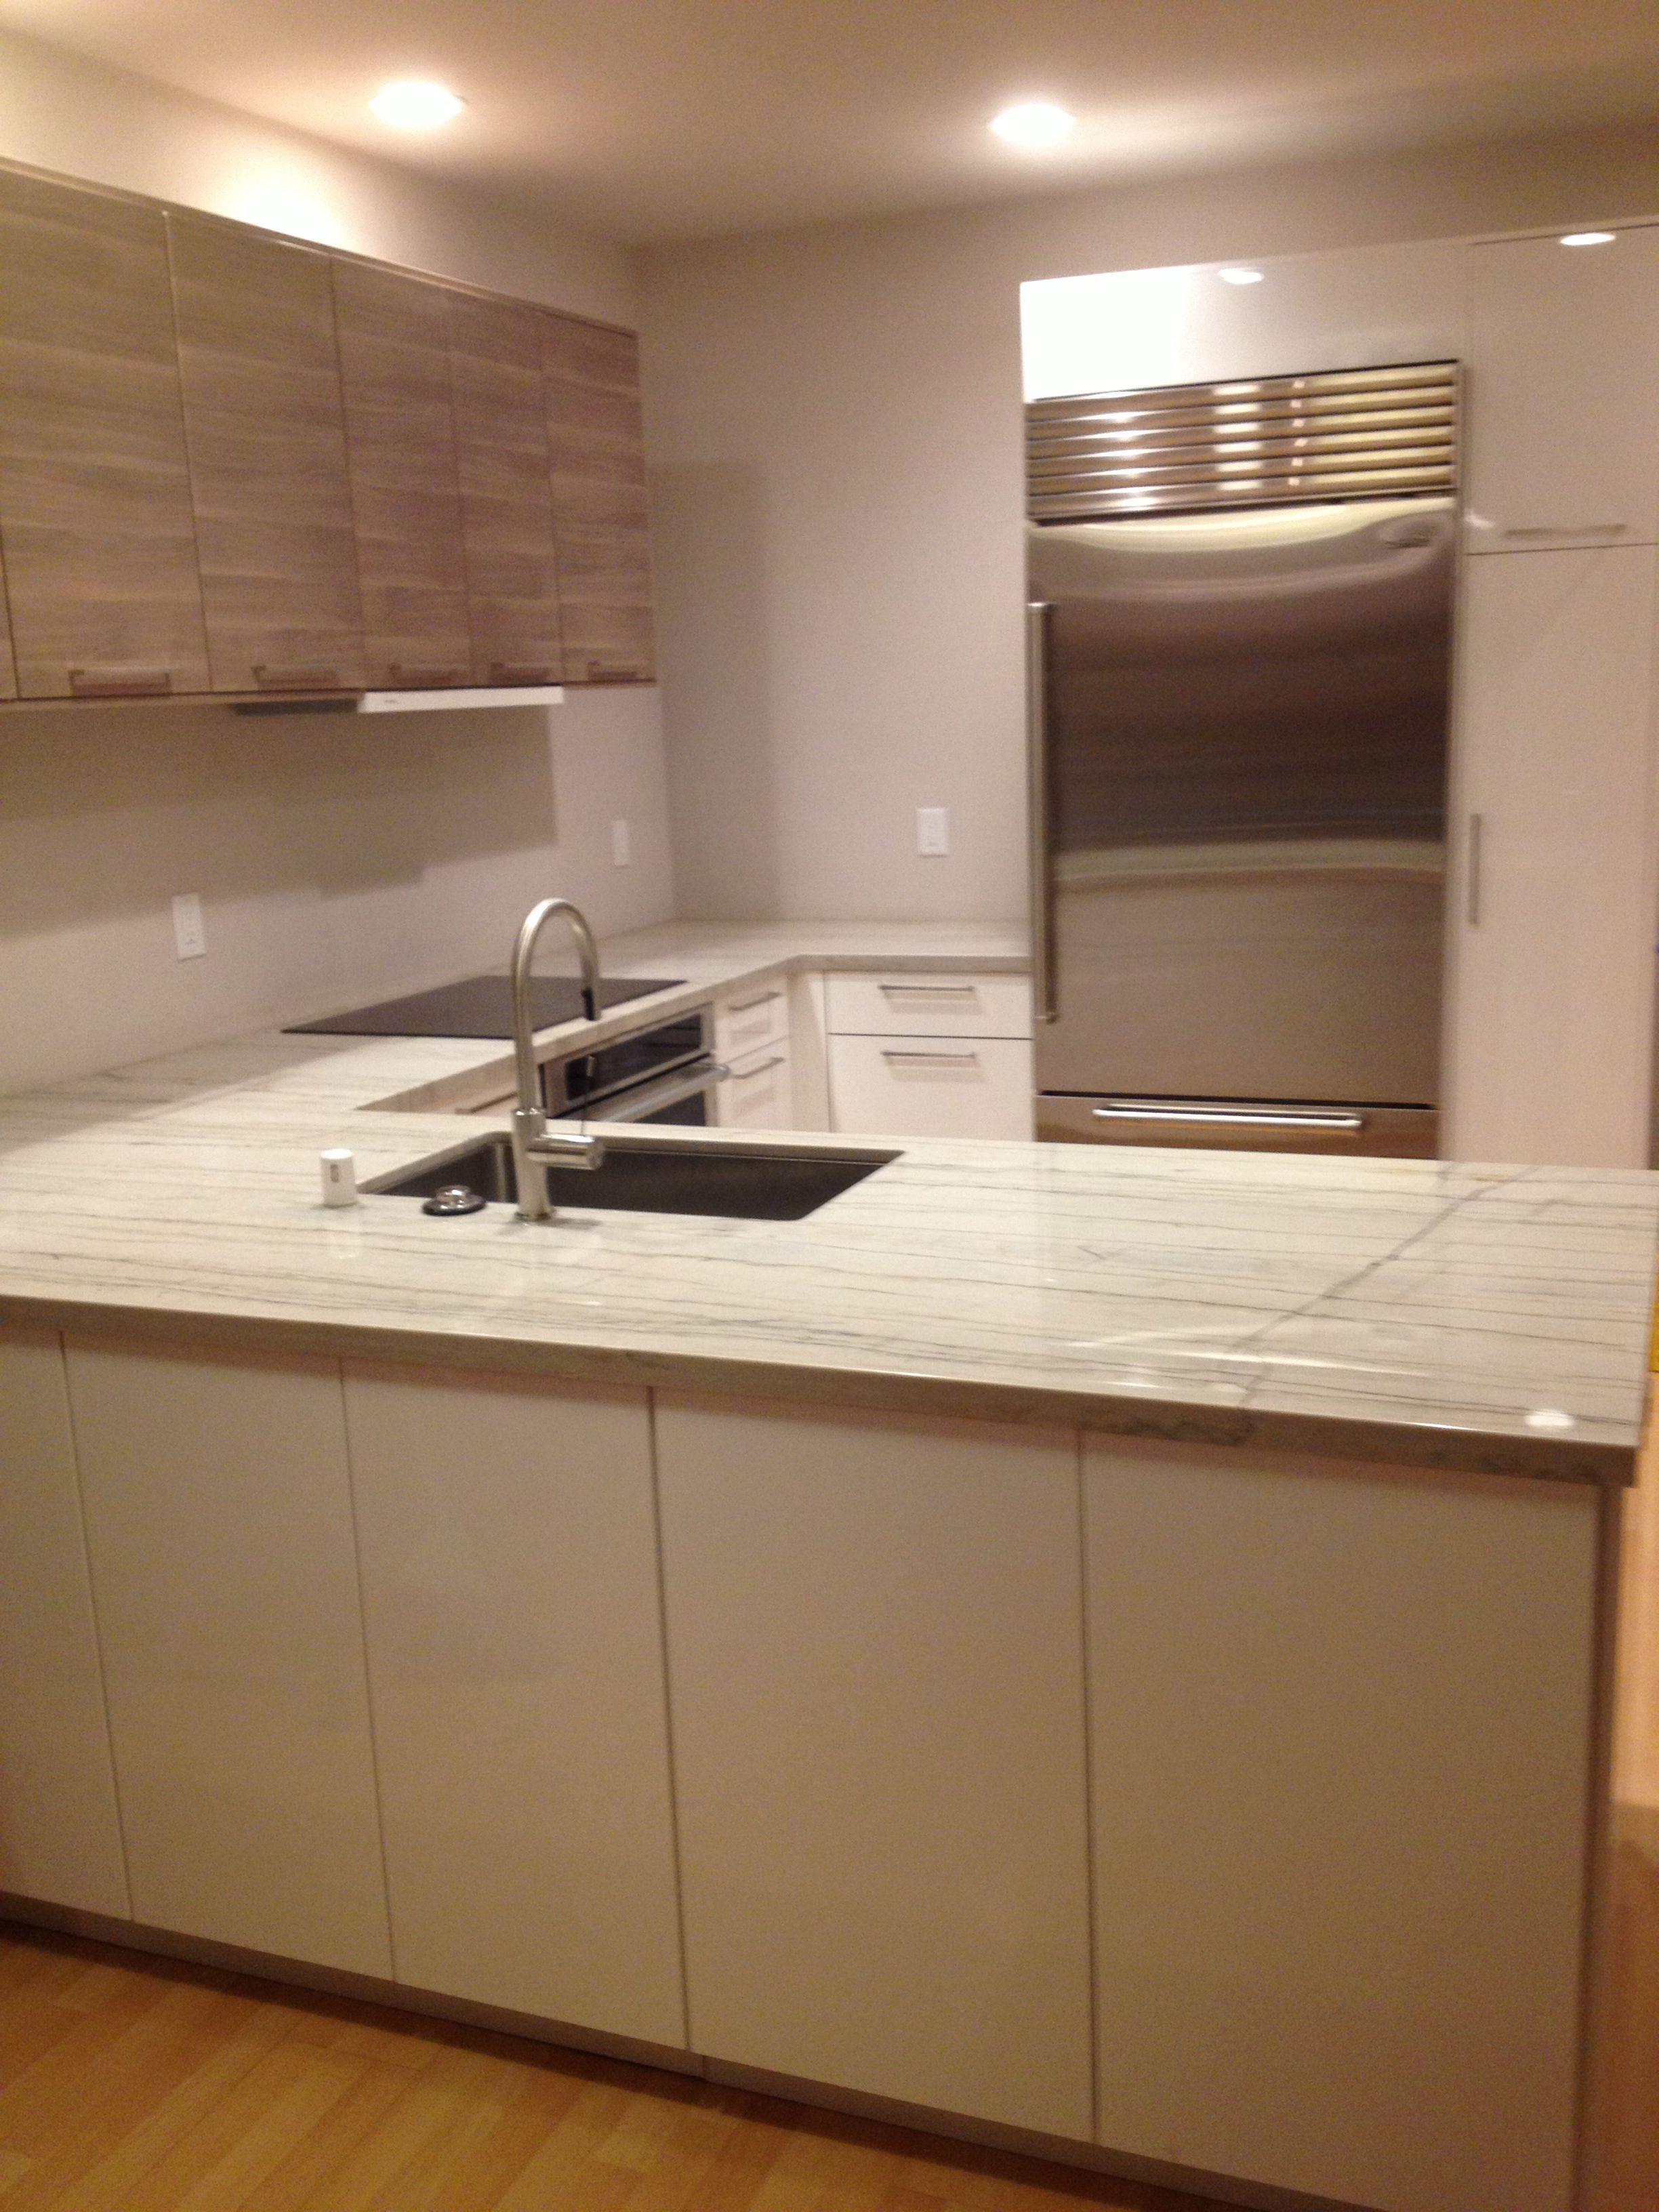 European Cabinets Palo Alto Kitchen In Palo Alto Ca Ikea Cabinets Granite Top Stainless